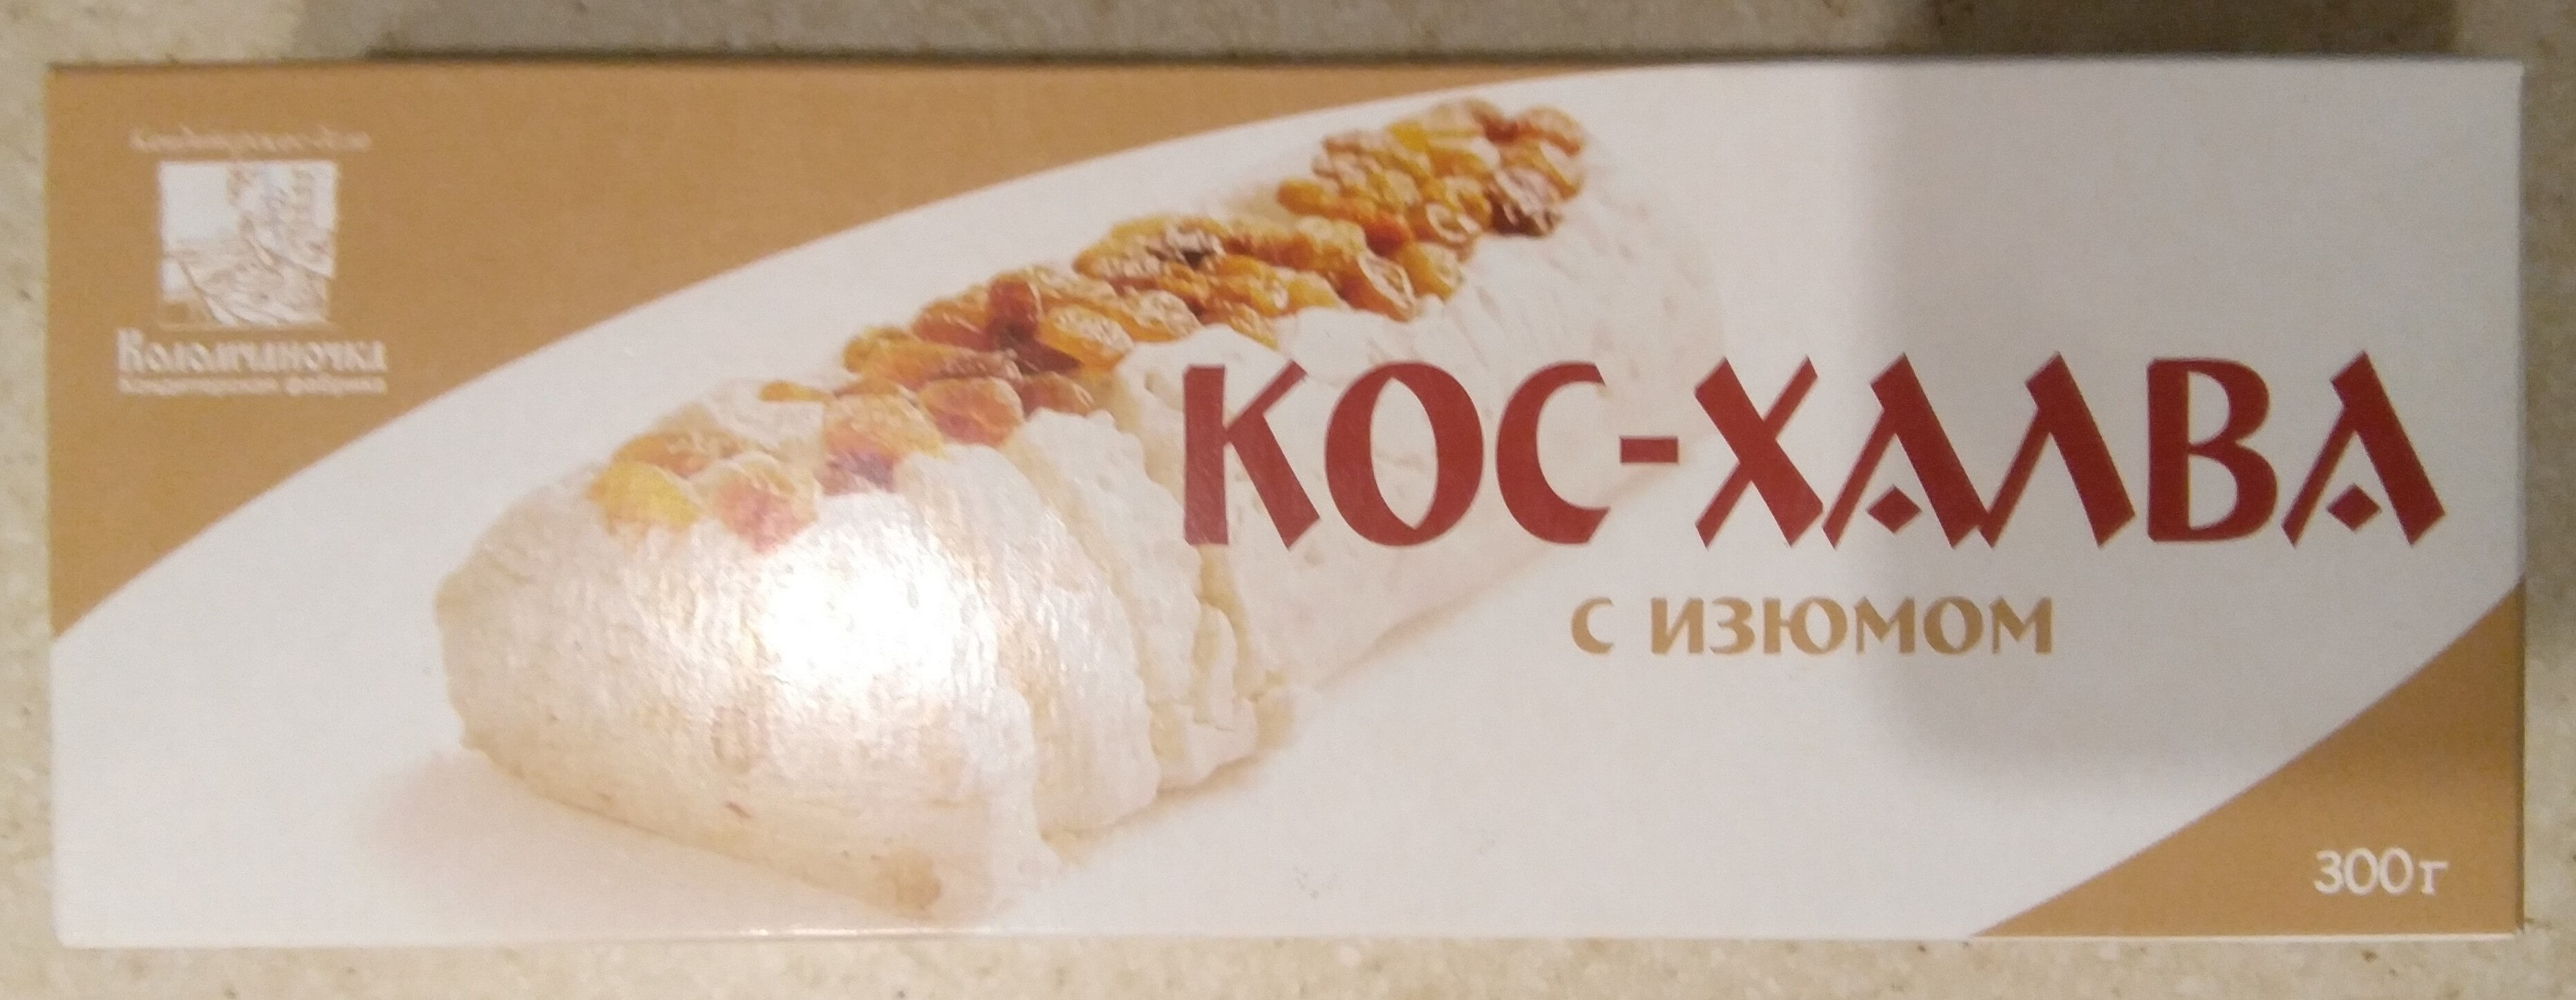 Кос-халва с изюмом - Product - ru